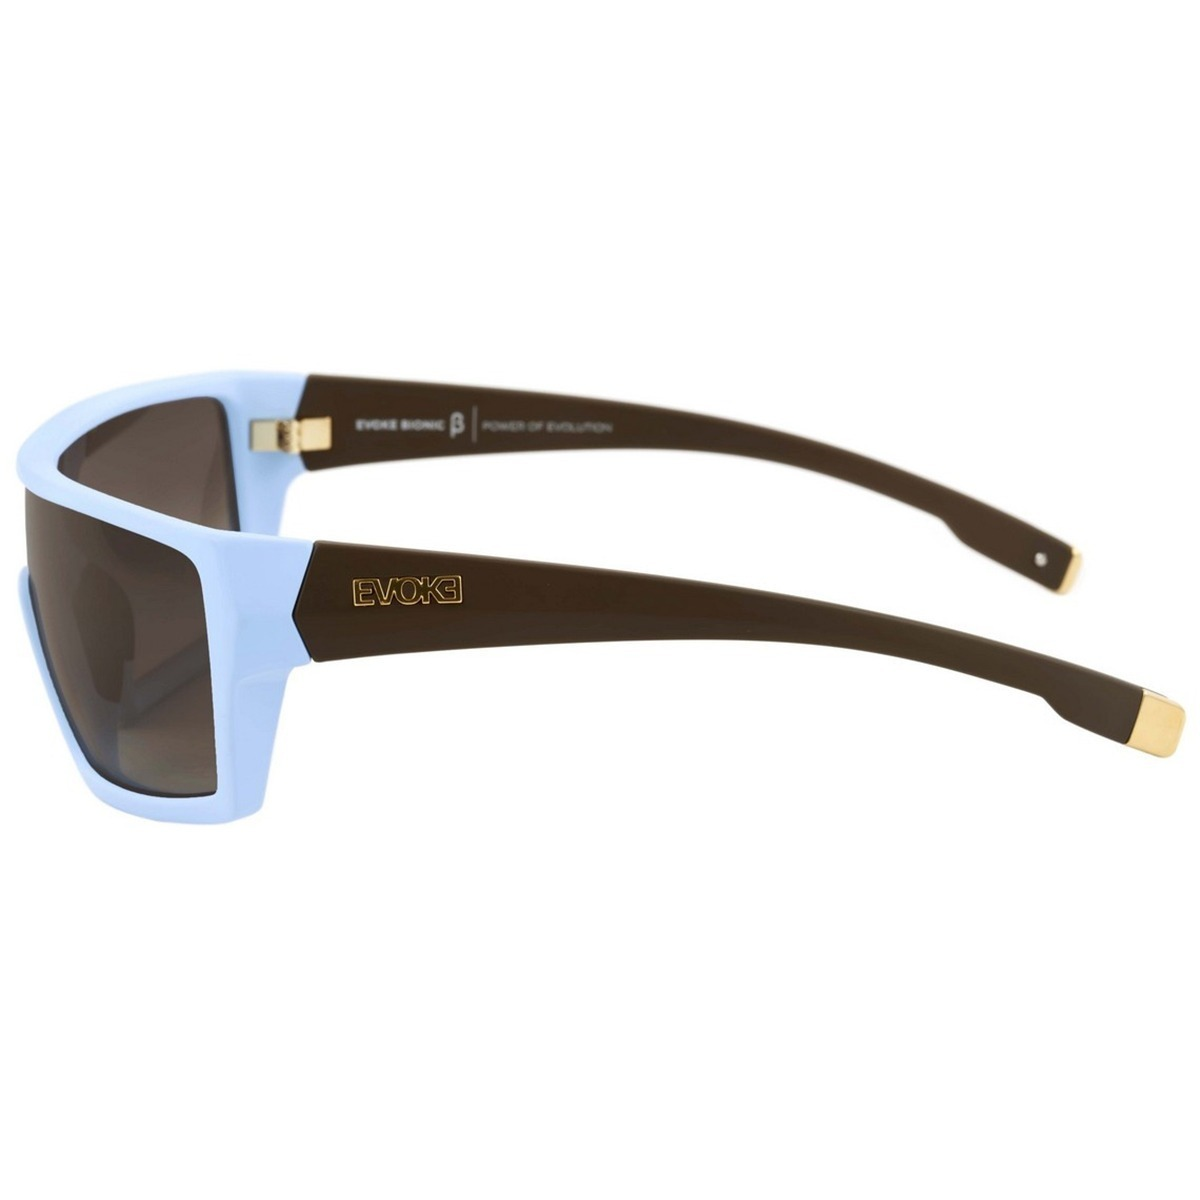 01d431bddfecb Oculos Sol Evoke Bionic Beta Azul Temple Marrom Gold Degrade - R ...